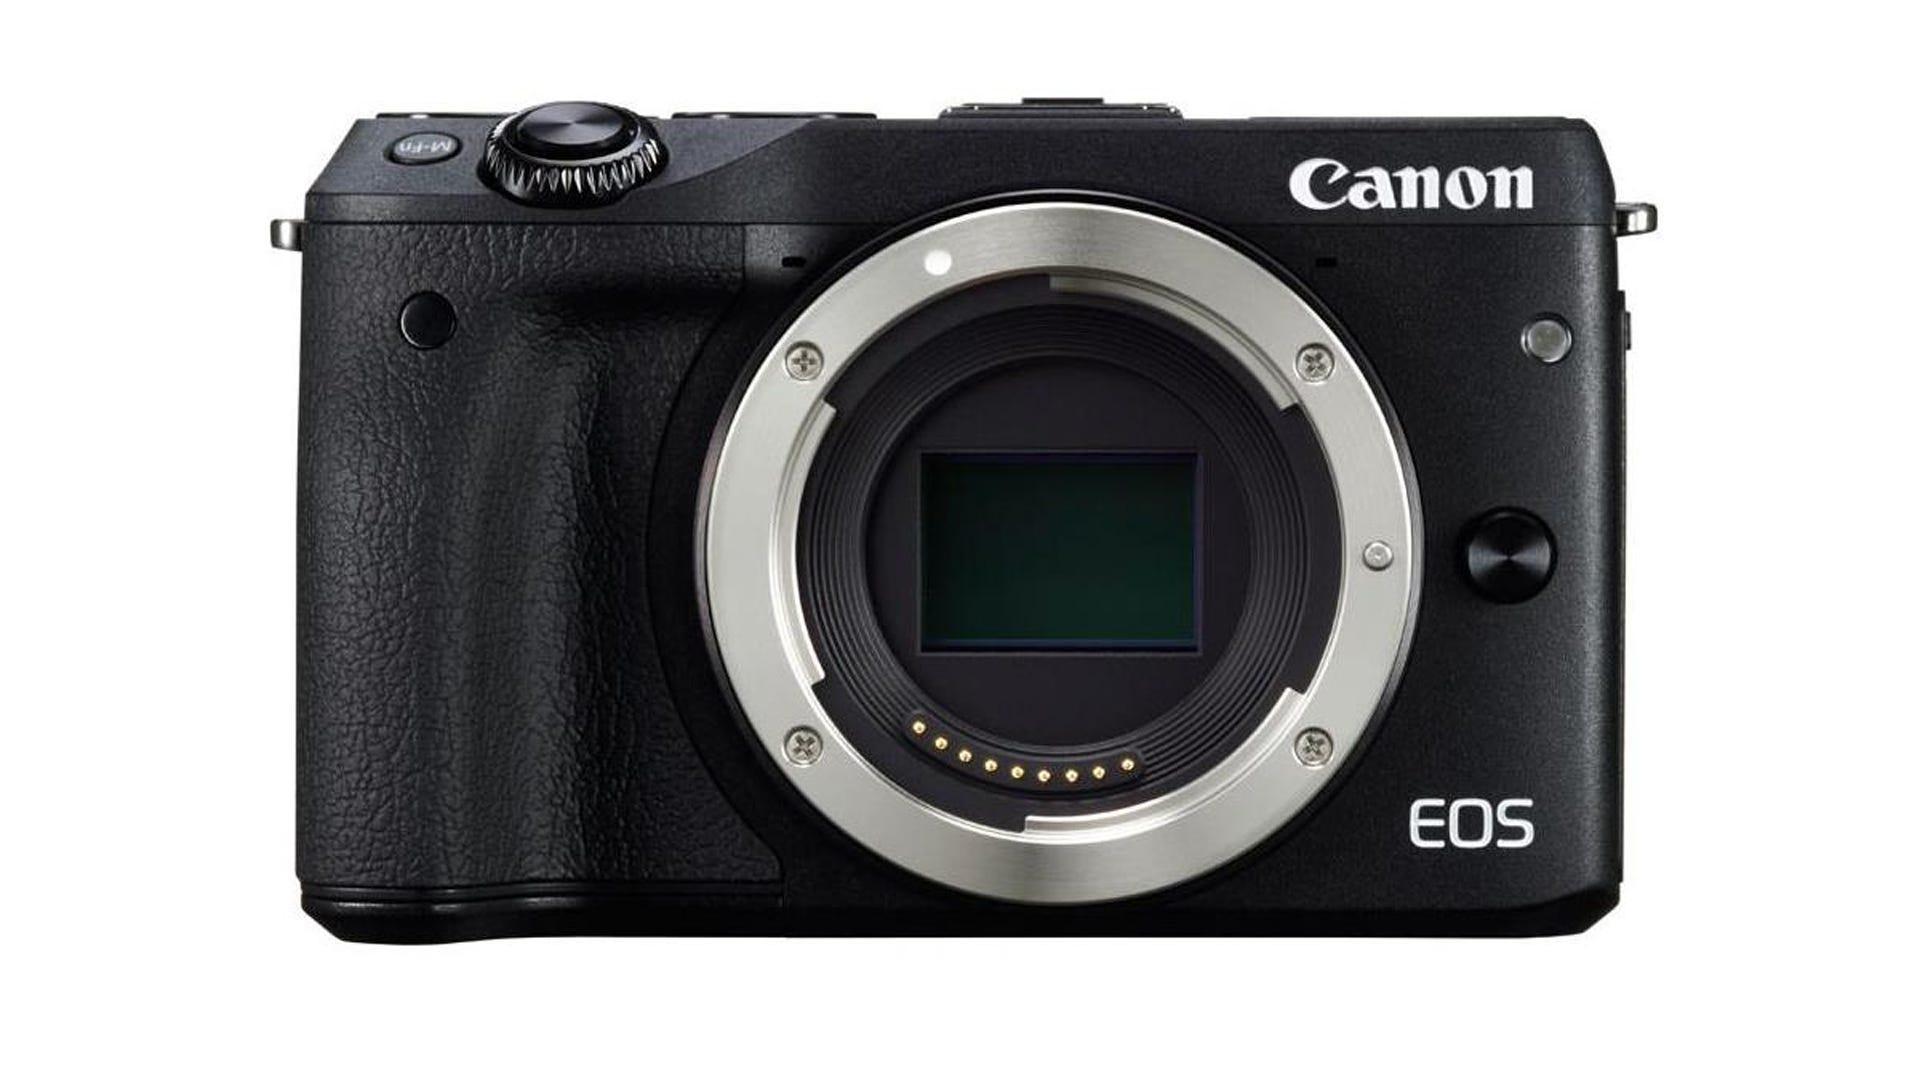 Canon EOS M3 Gets Major Makeover